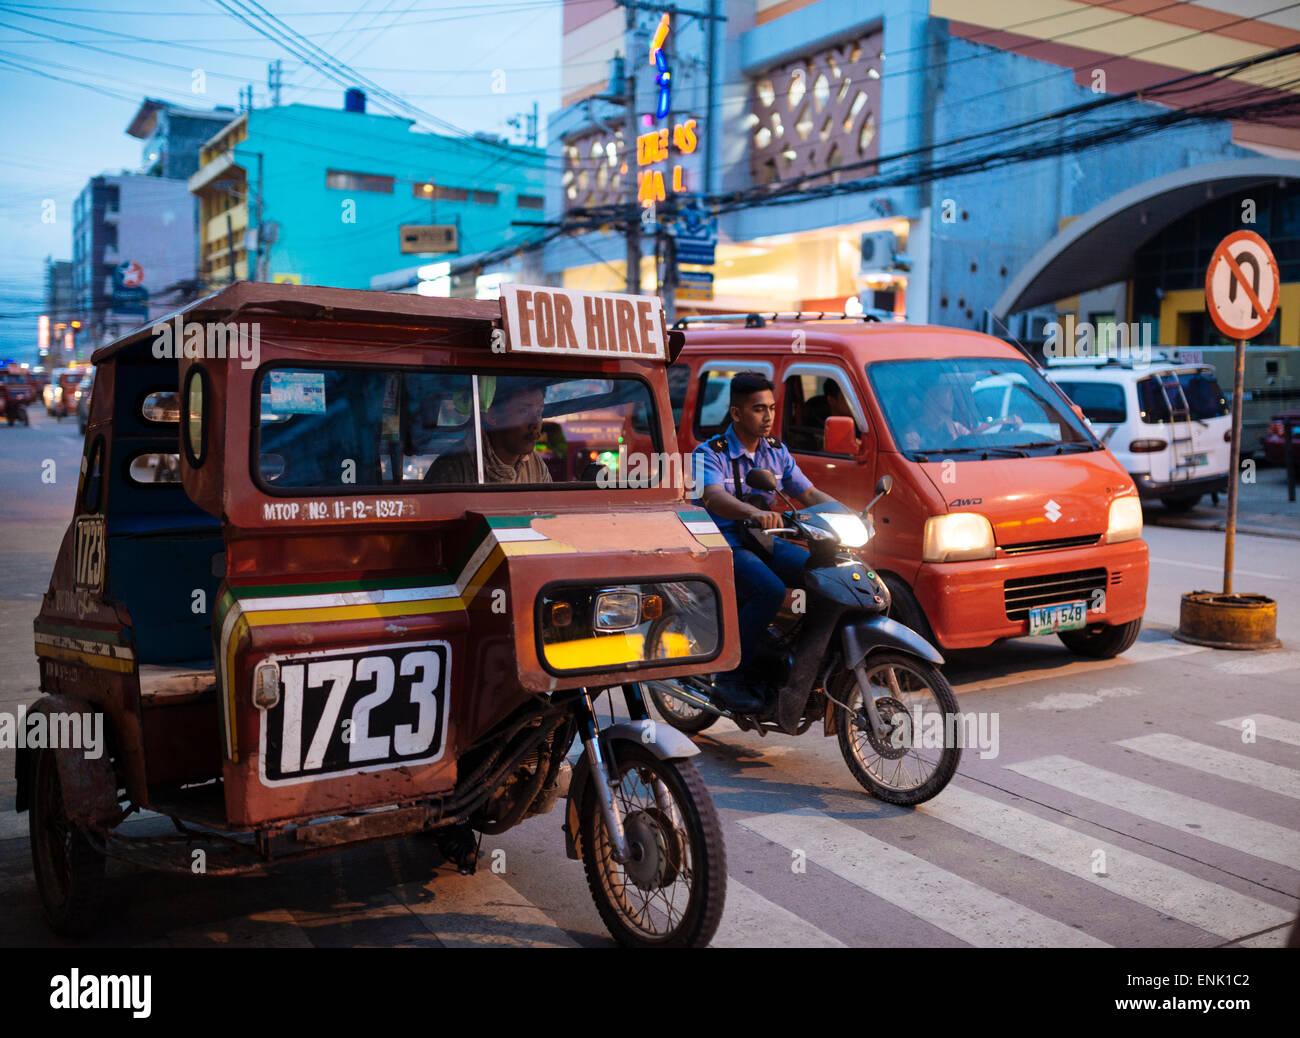 Tuk tuk, Tagbilaran, Bohol Island, Visayas, Philippines, Southeast Asia, Asia - Stock Image